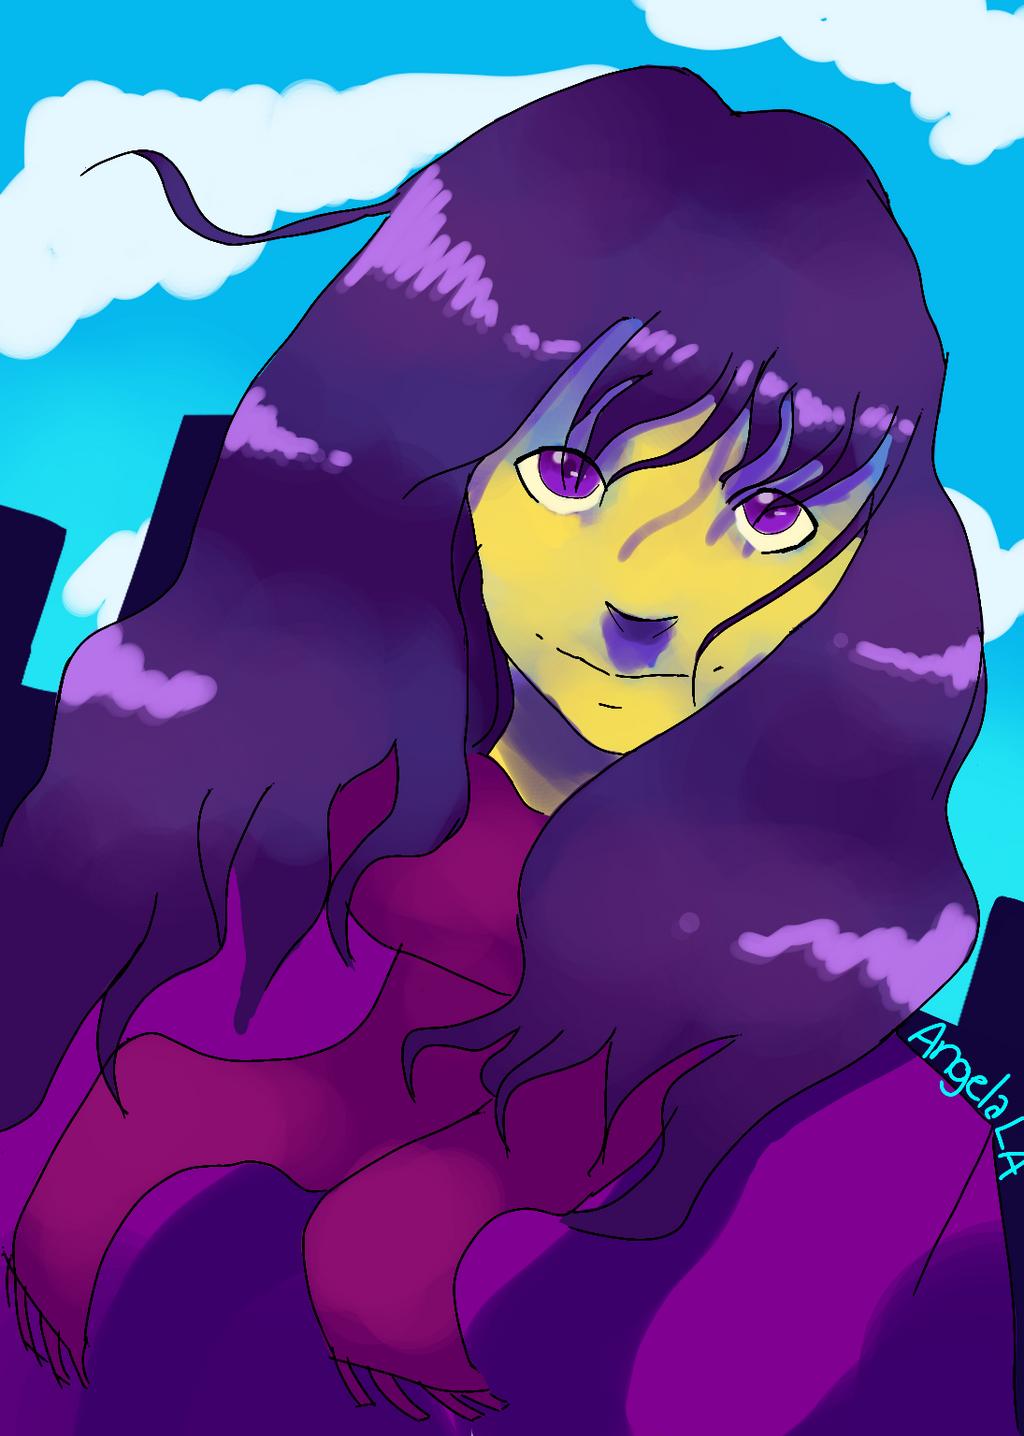 Purple Hair, Blue Sky by Muuluzi